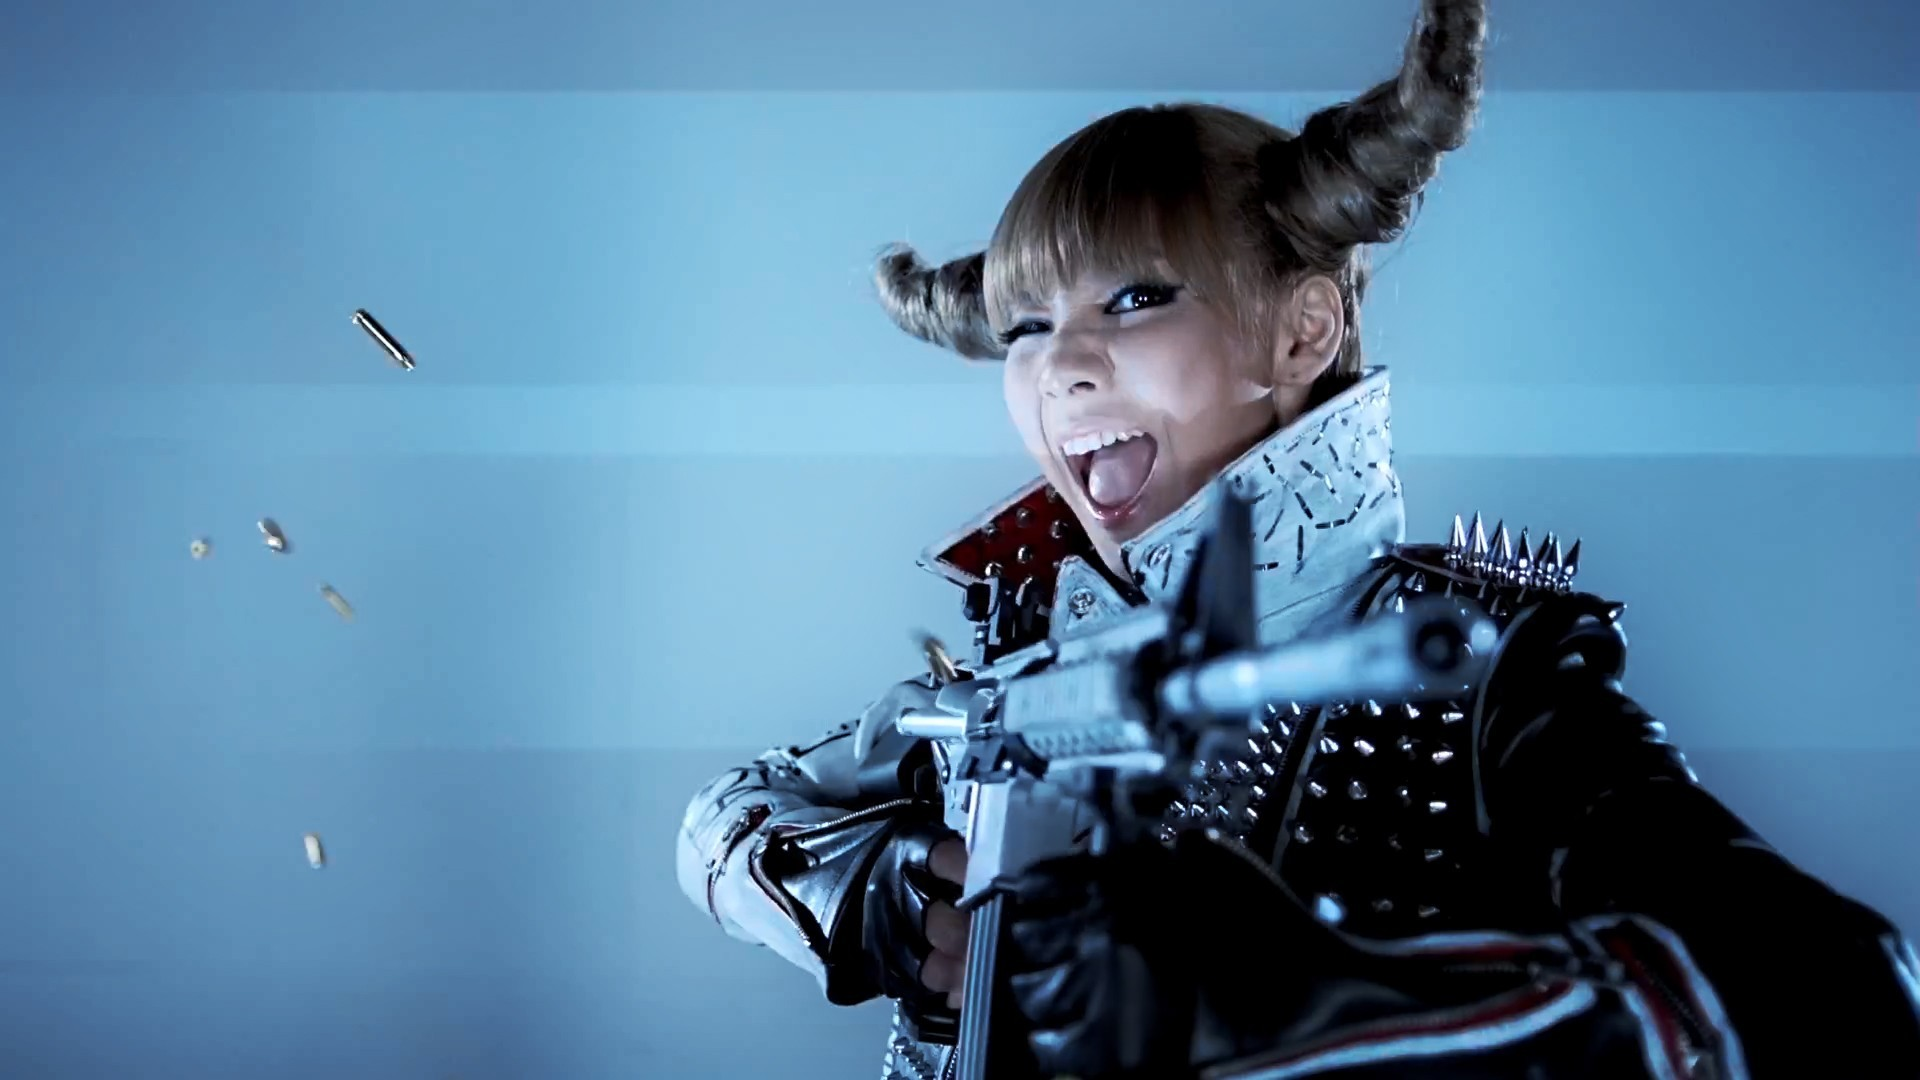 Guns screenshots spikes 2NE1 K-Pop music video CL (singer) People's  Republic of China punk girl hairstyle wallpaper | | 59672 |  WallpaperUP